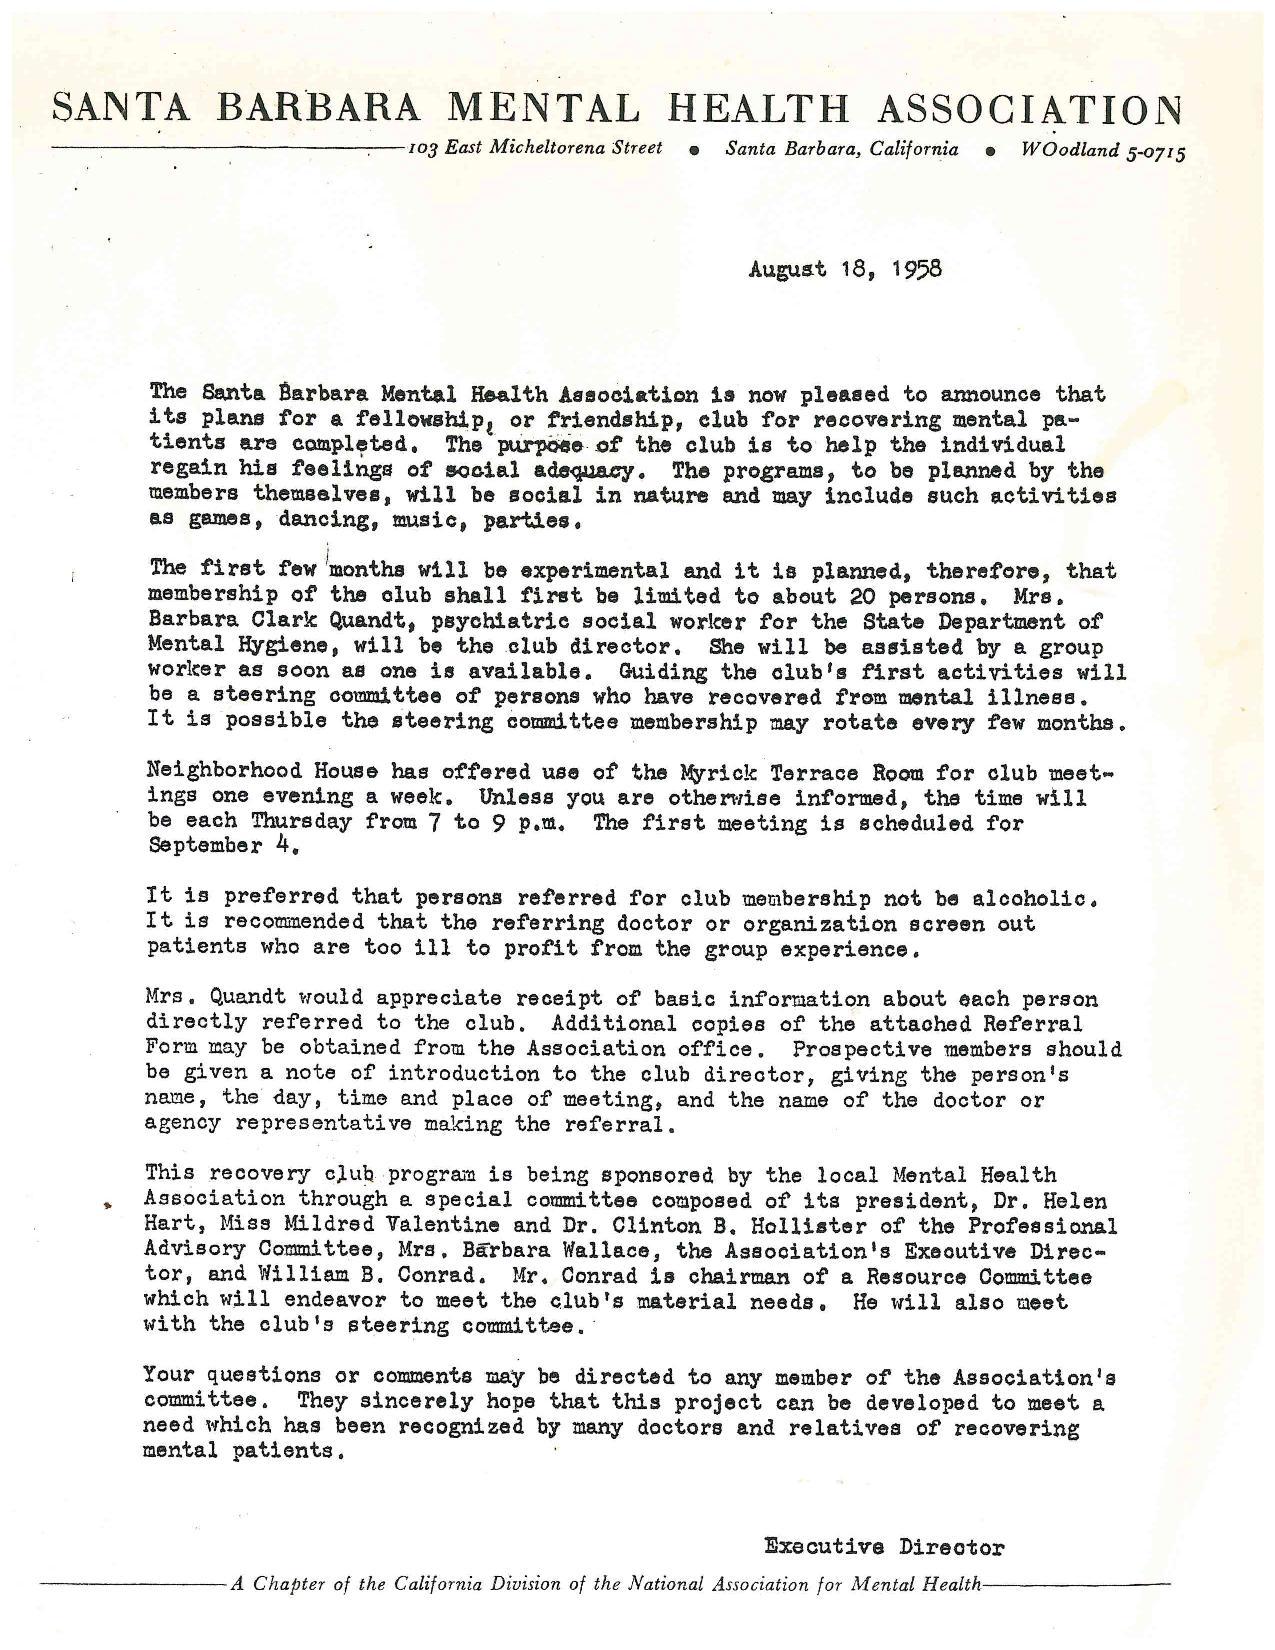 photo 41 SB mental health Ass 8.18.1958-page-001.jpg